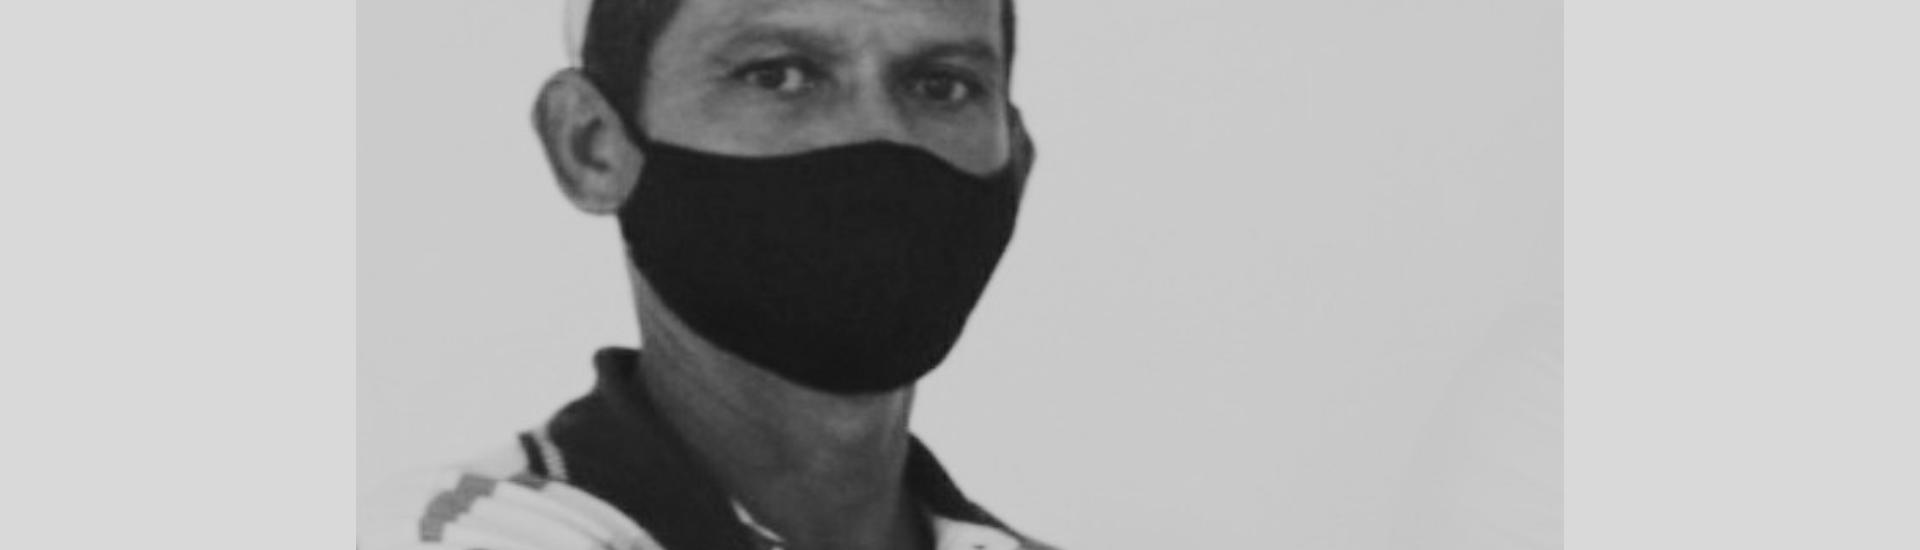 Bolívar: asesinan al líder comunal Martin Bayona